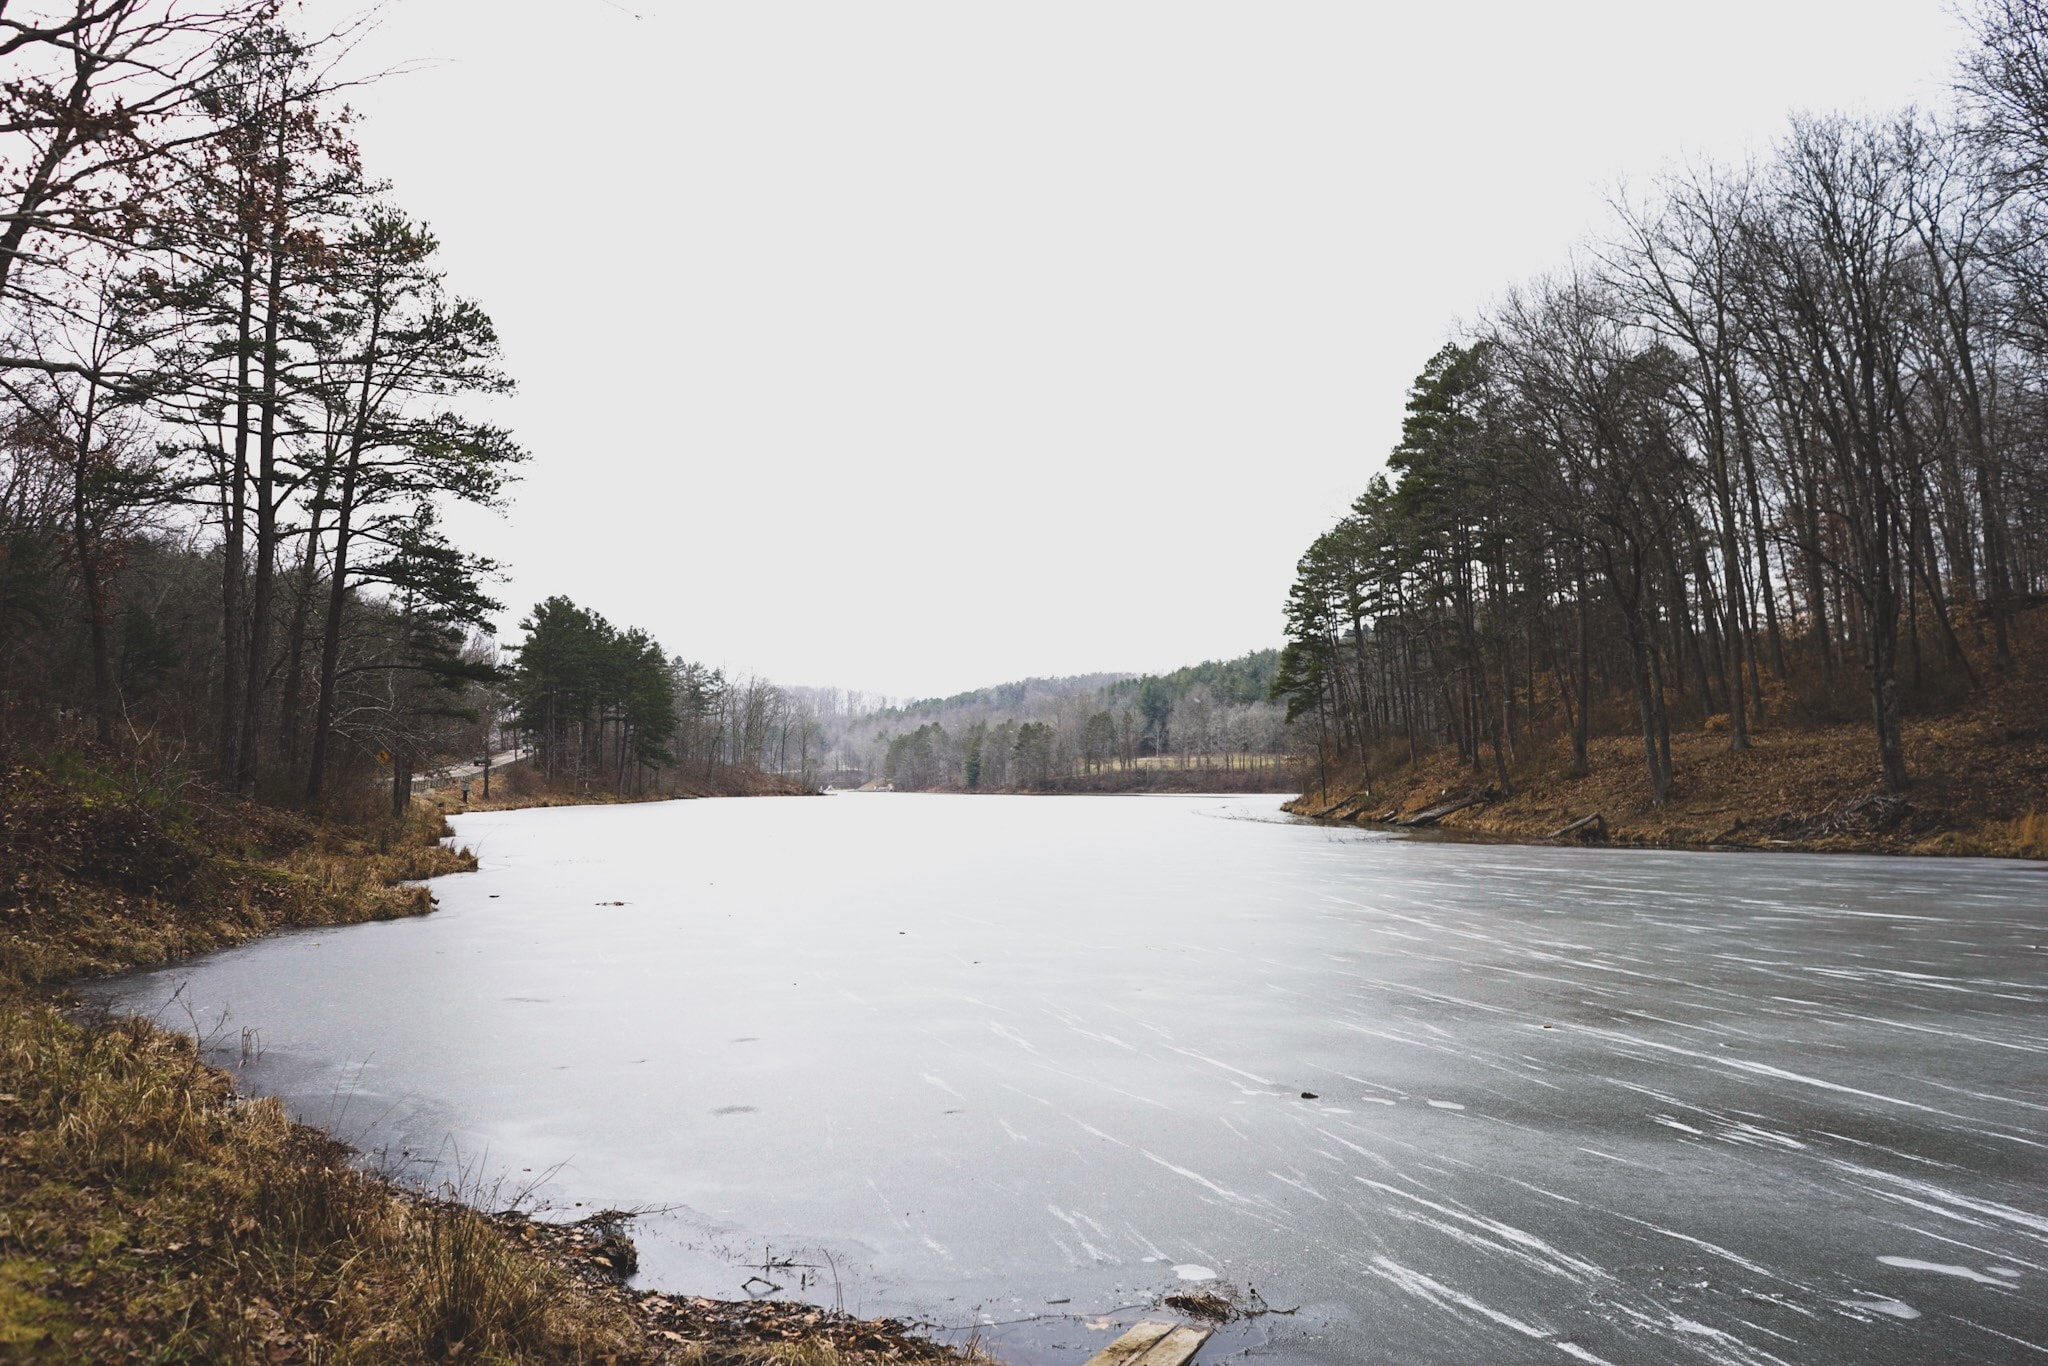 A small frozen lake under pale white sky